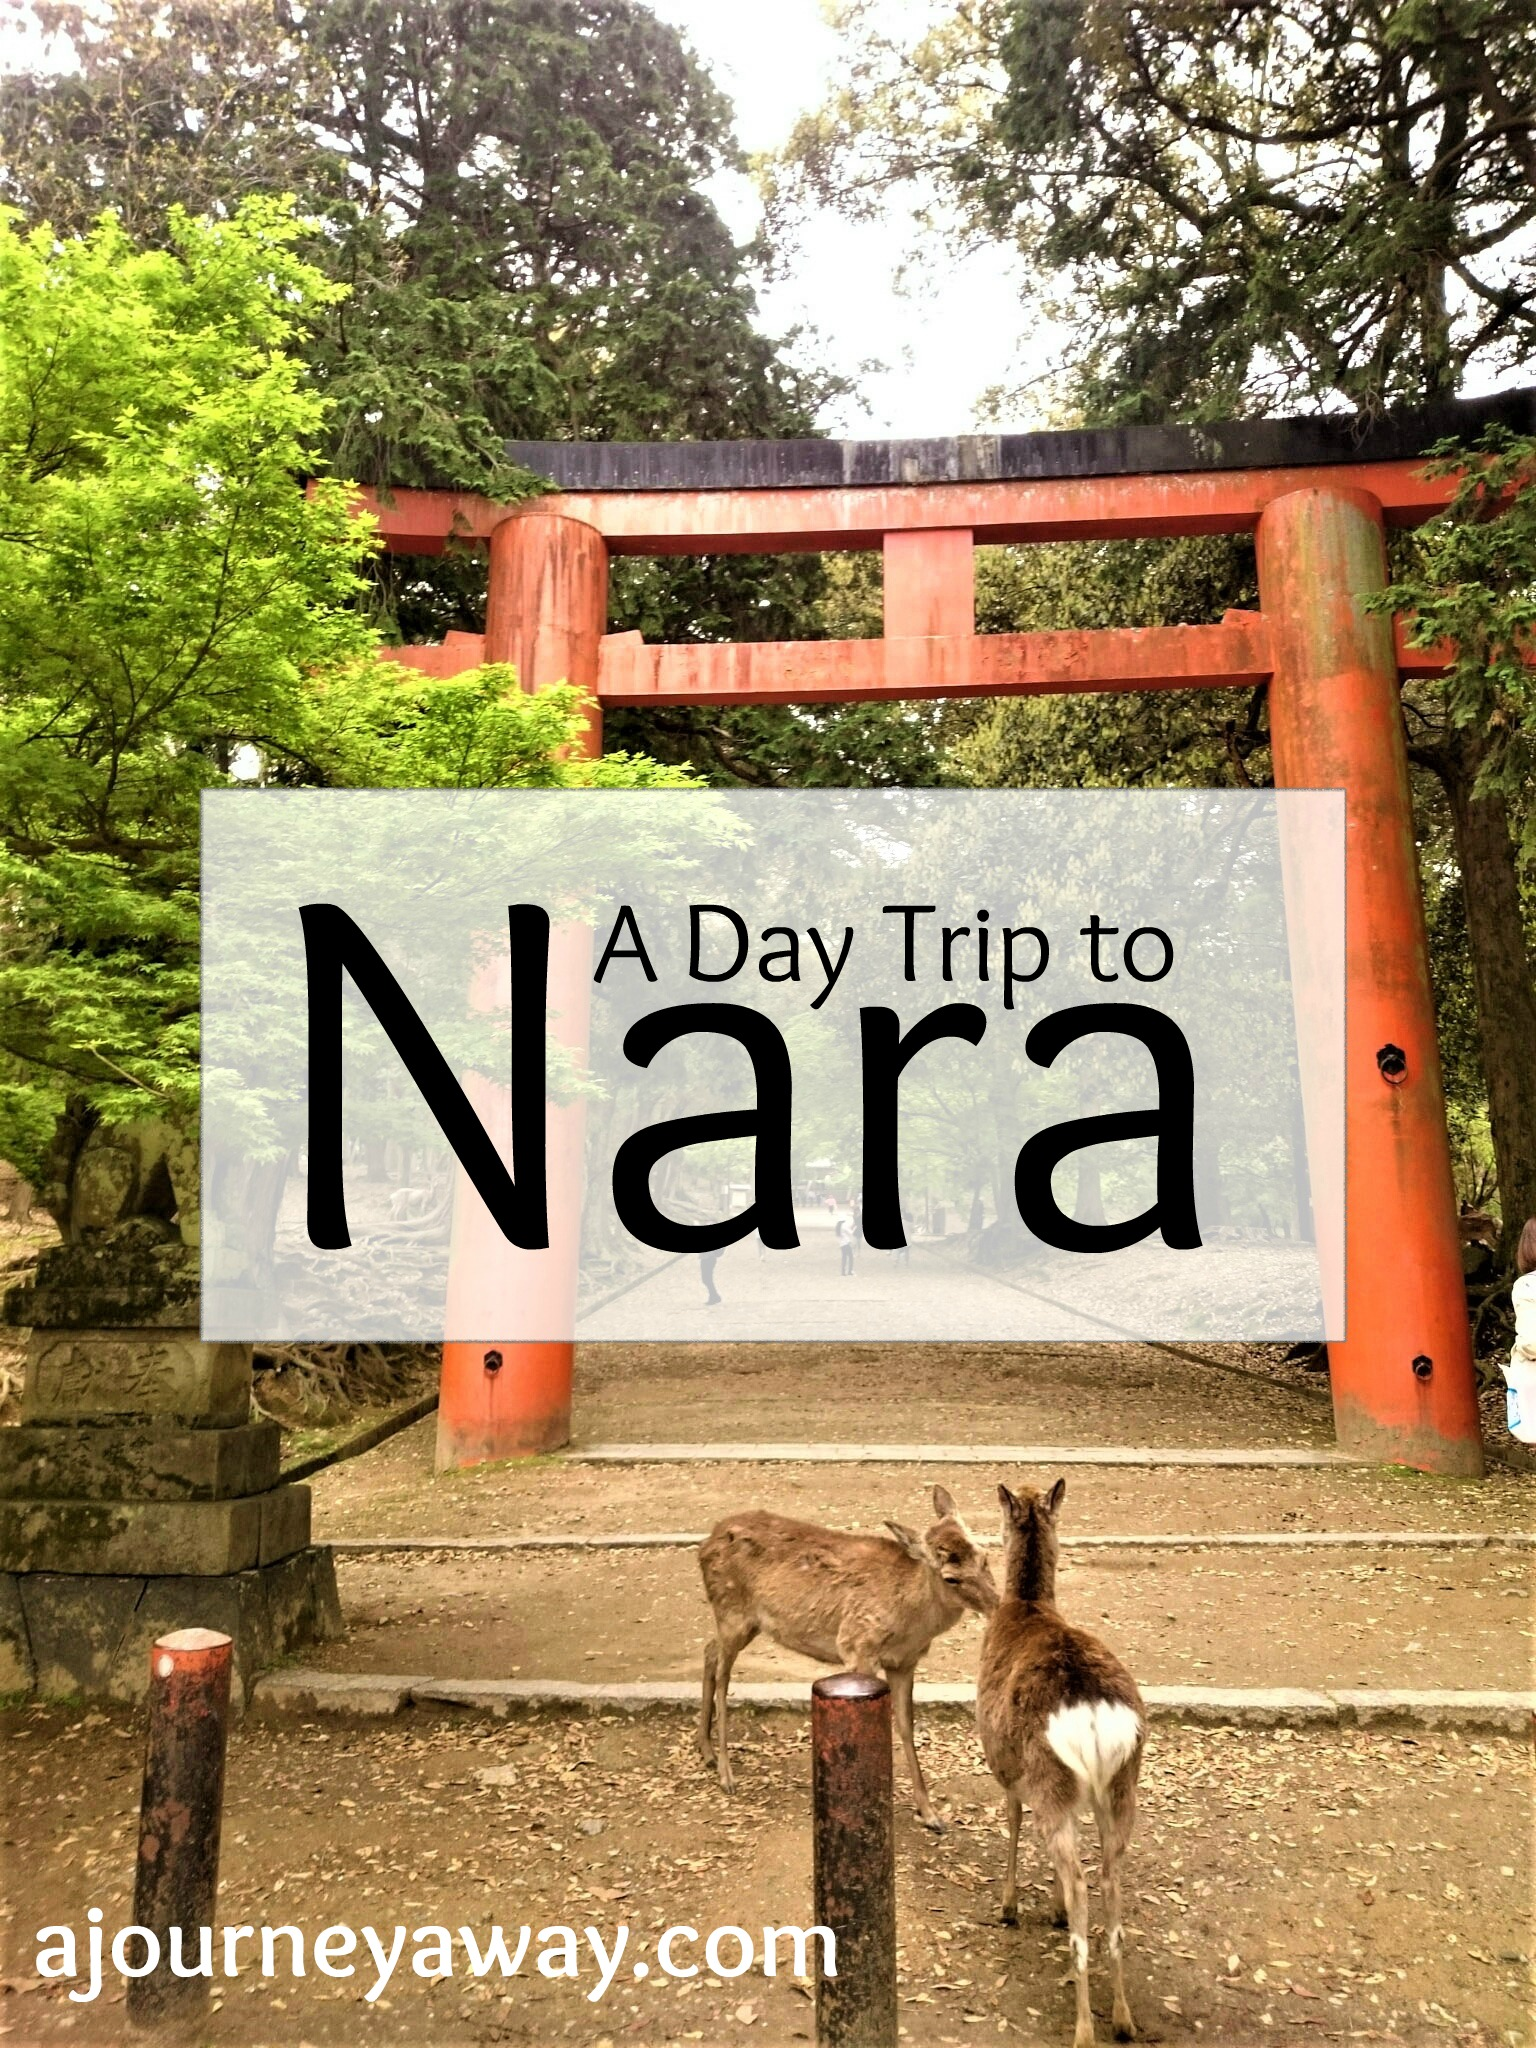 A day trip to Nara, Japan